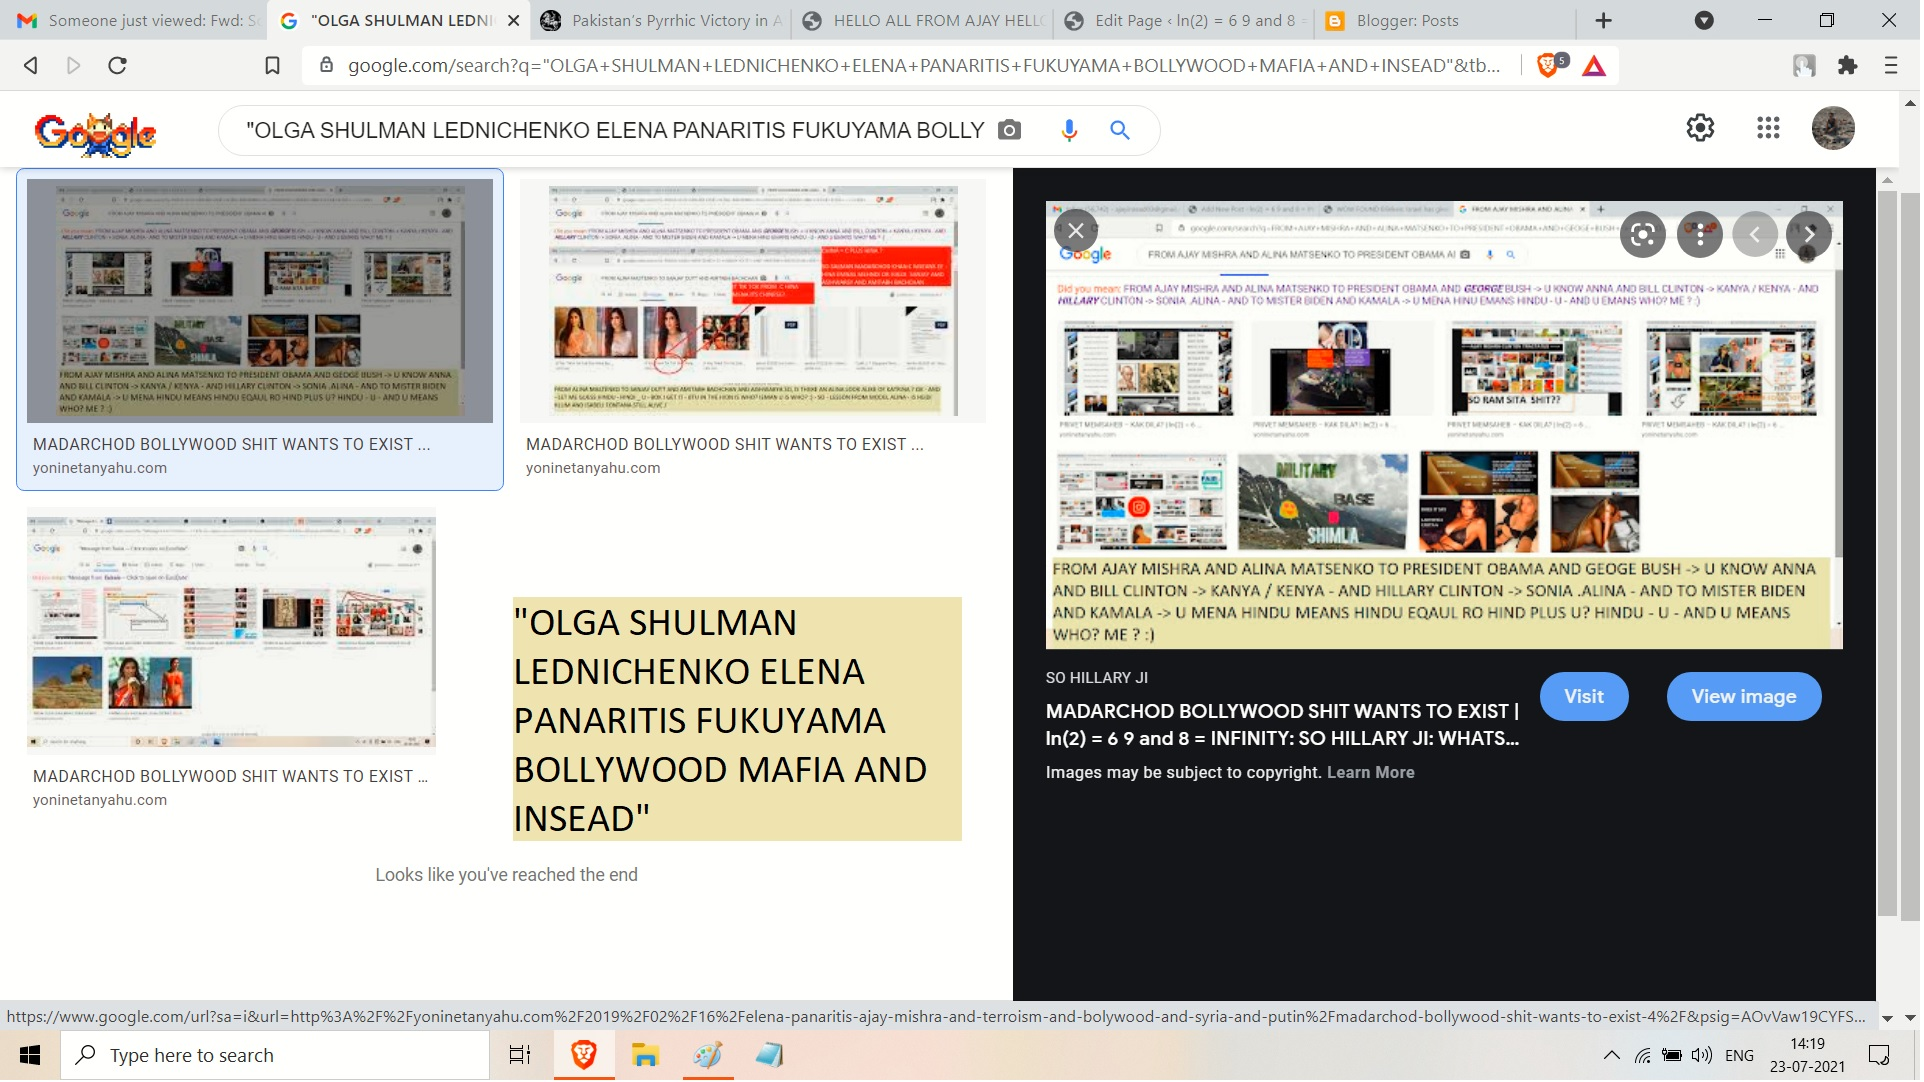 OLGA SHULMAN LEDNICHENKO ELENA PANARITIS FUKUYAMA BOLLYWOOD MAFIA AND INSEAD